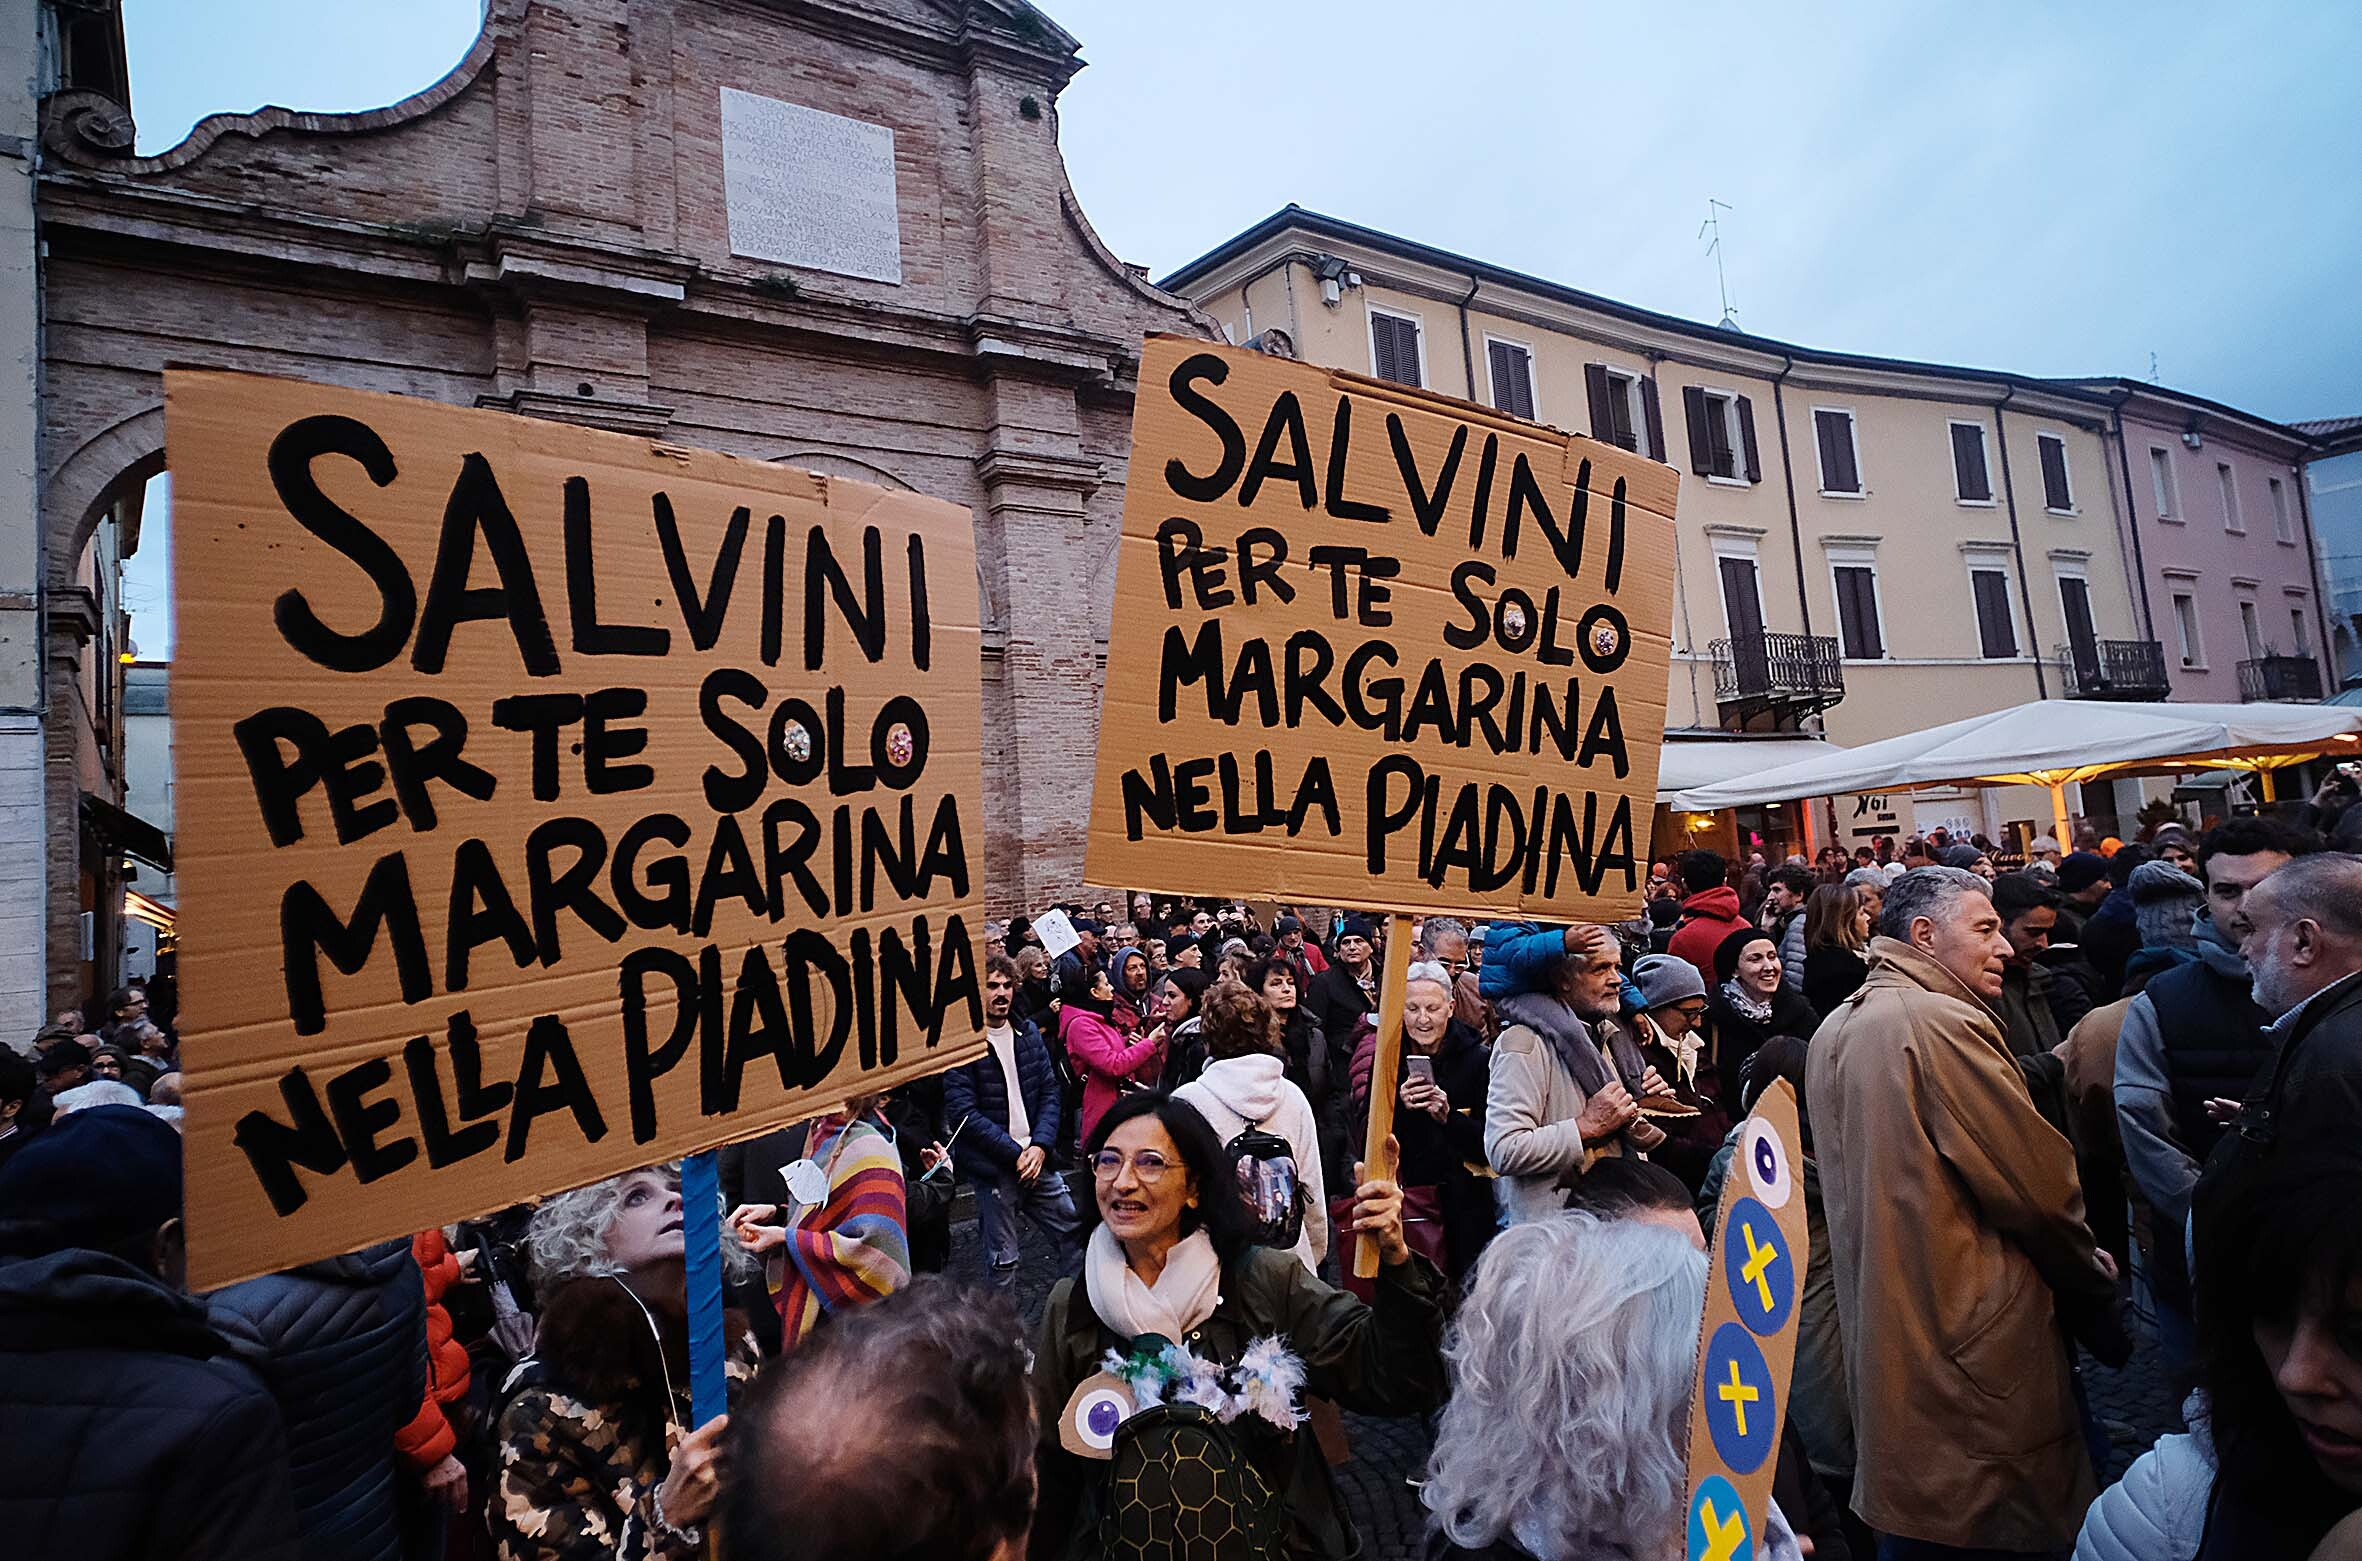 Domani Bonaccini vs Salvini a Rimini e Sardine vs Salvini a Verucchio